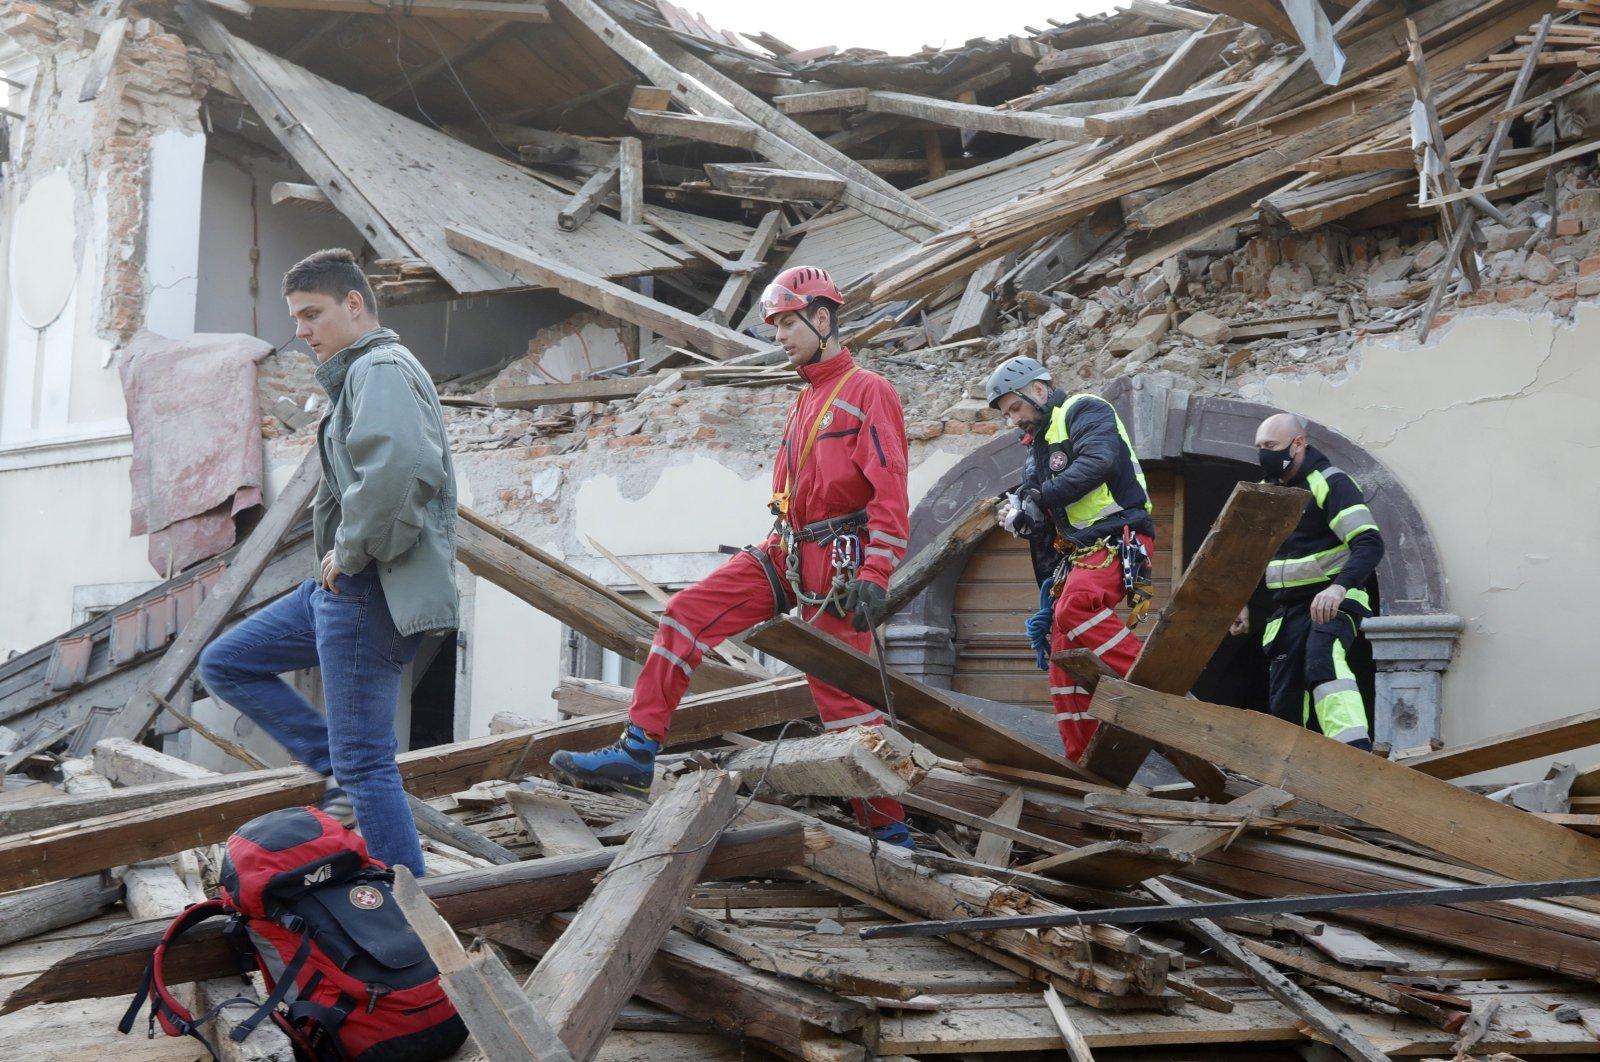 Workers clear a building damaged in an earthquake in Petrinja, Croatia, Dec. 29, 2020. (EPA Photo)